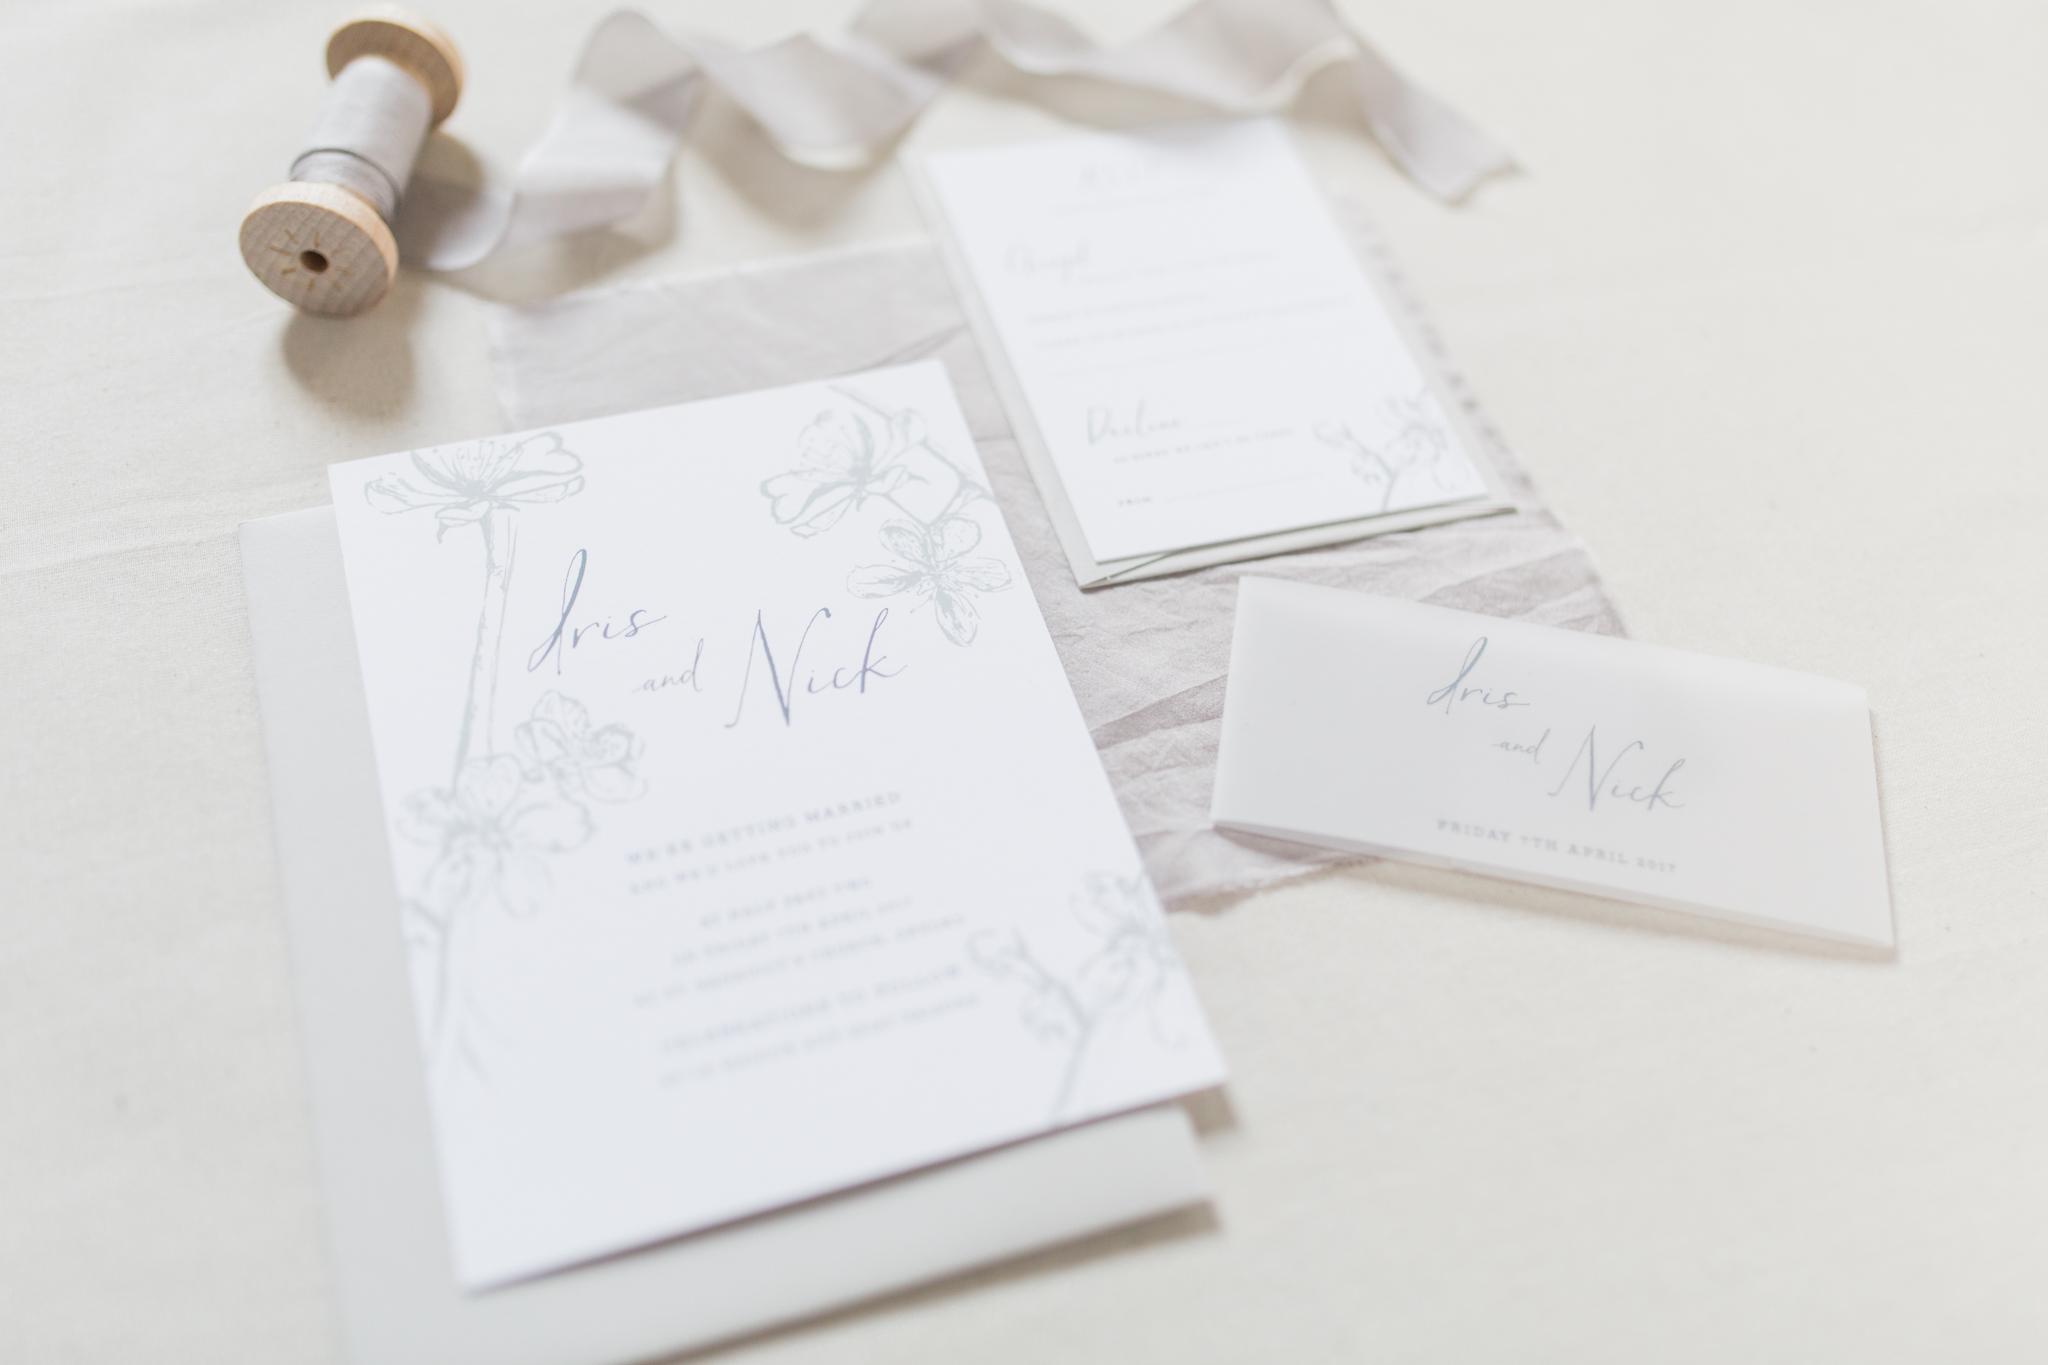 Inkflower Press Plum Blossom silkscreen printed wedding invitation suite - Pebble Grey